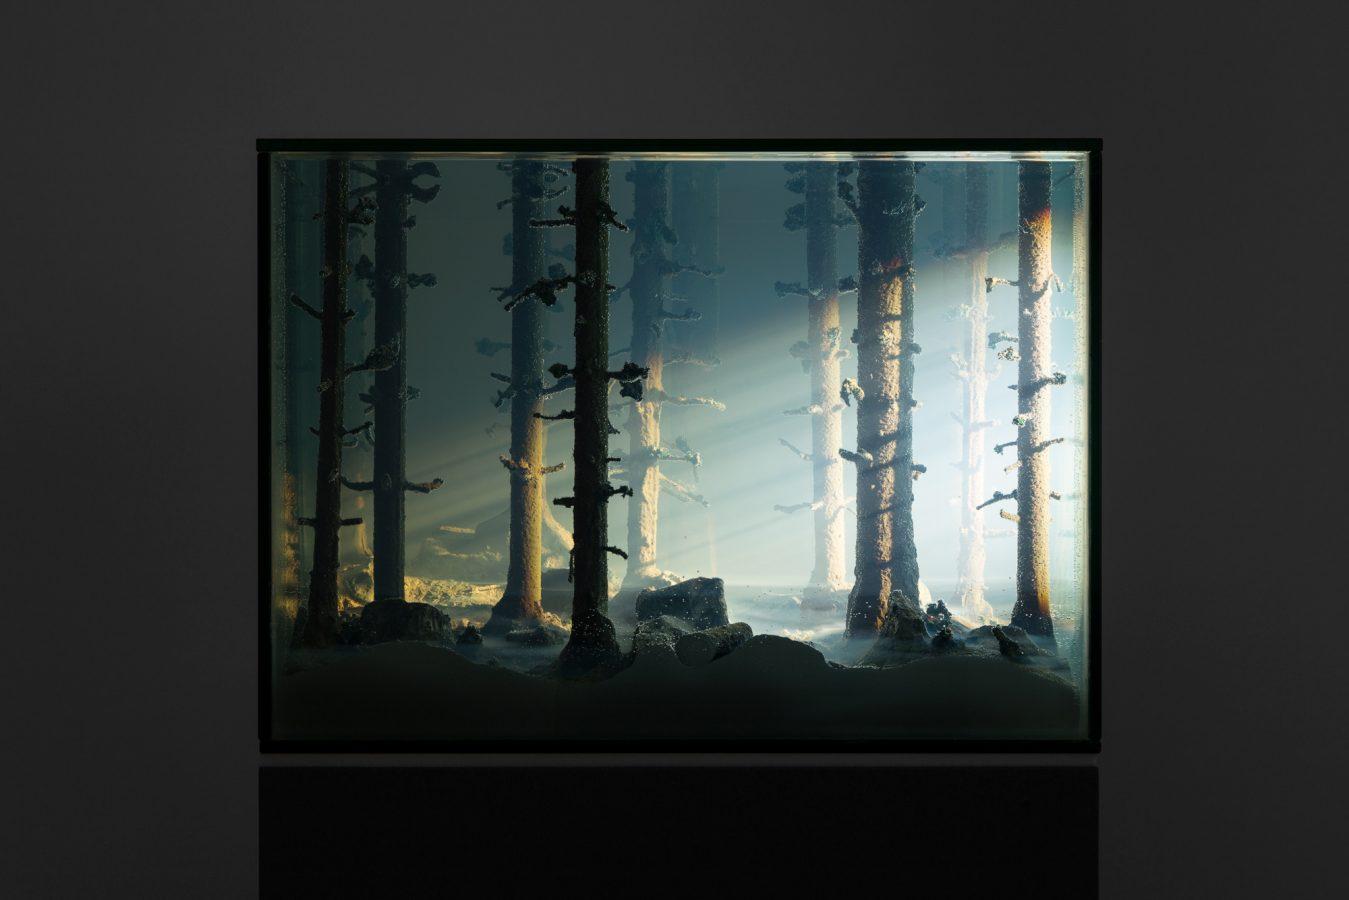 Galeria Pedro Cera – Mariele Neudecker - Echo Chamber